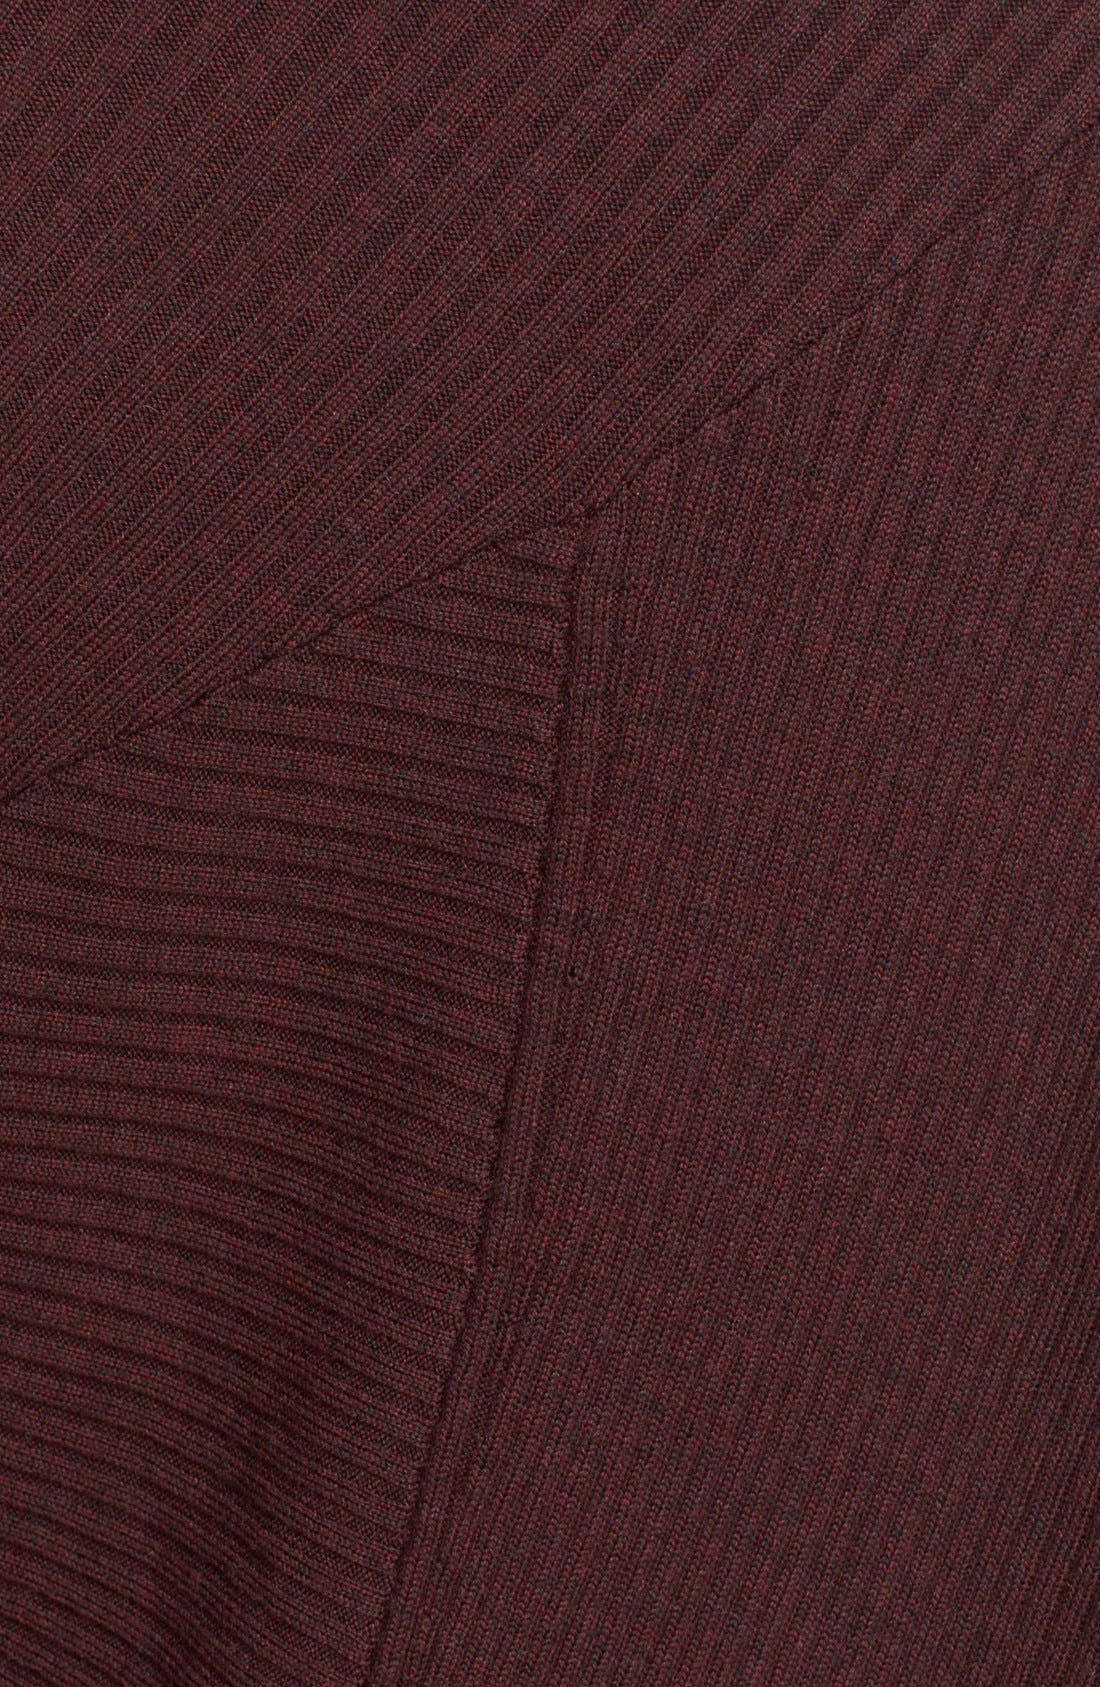 Knit Merino Wool Swing Dress,                             Alternate thumbnail 4, color,                             930